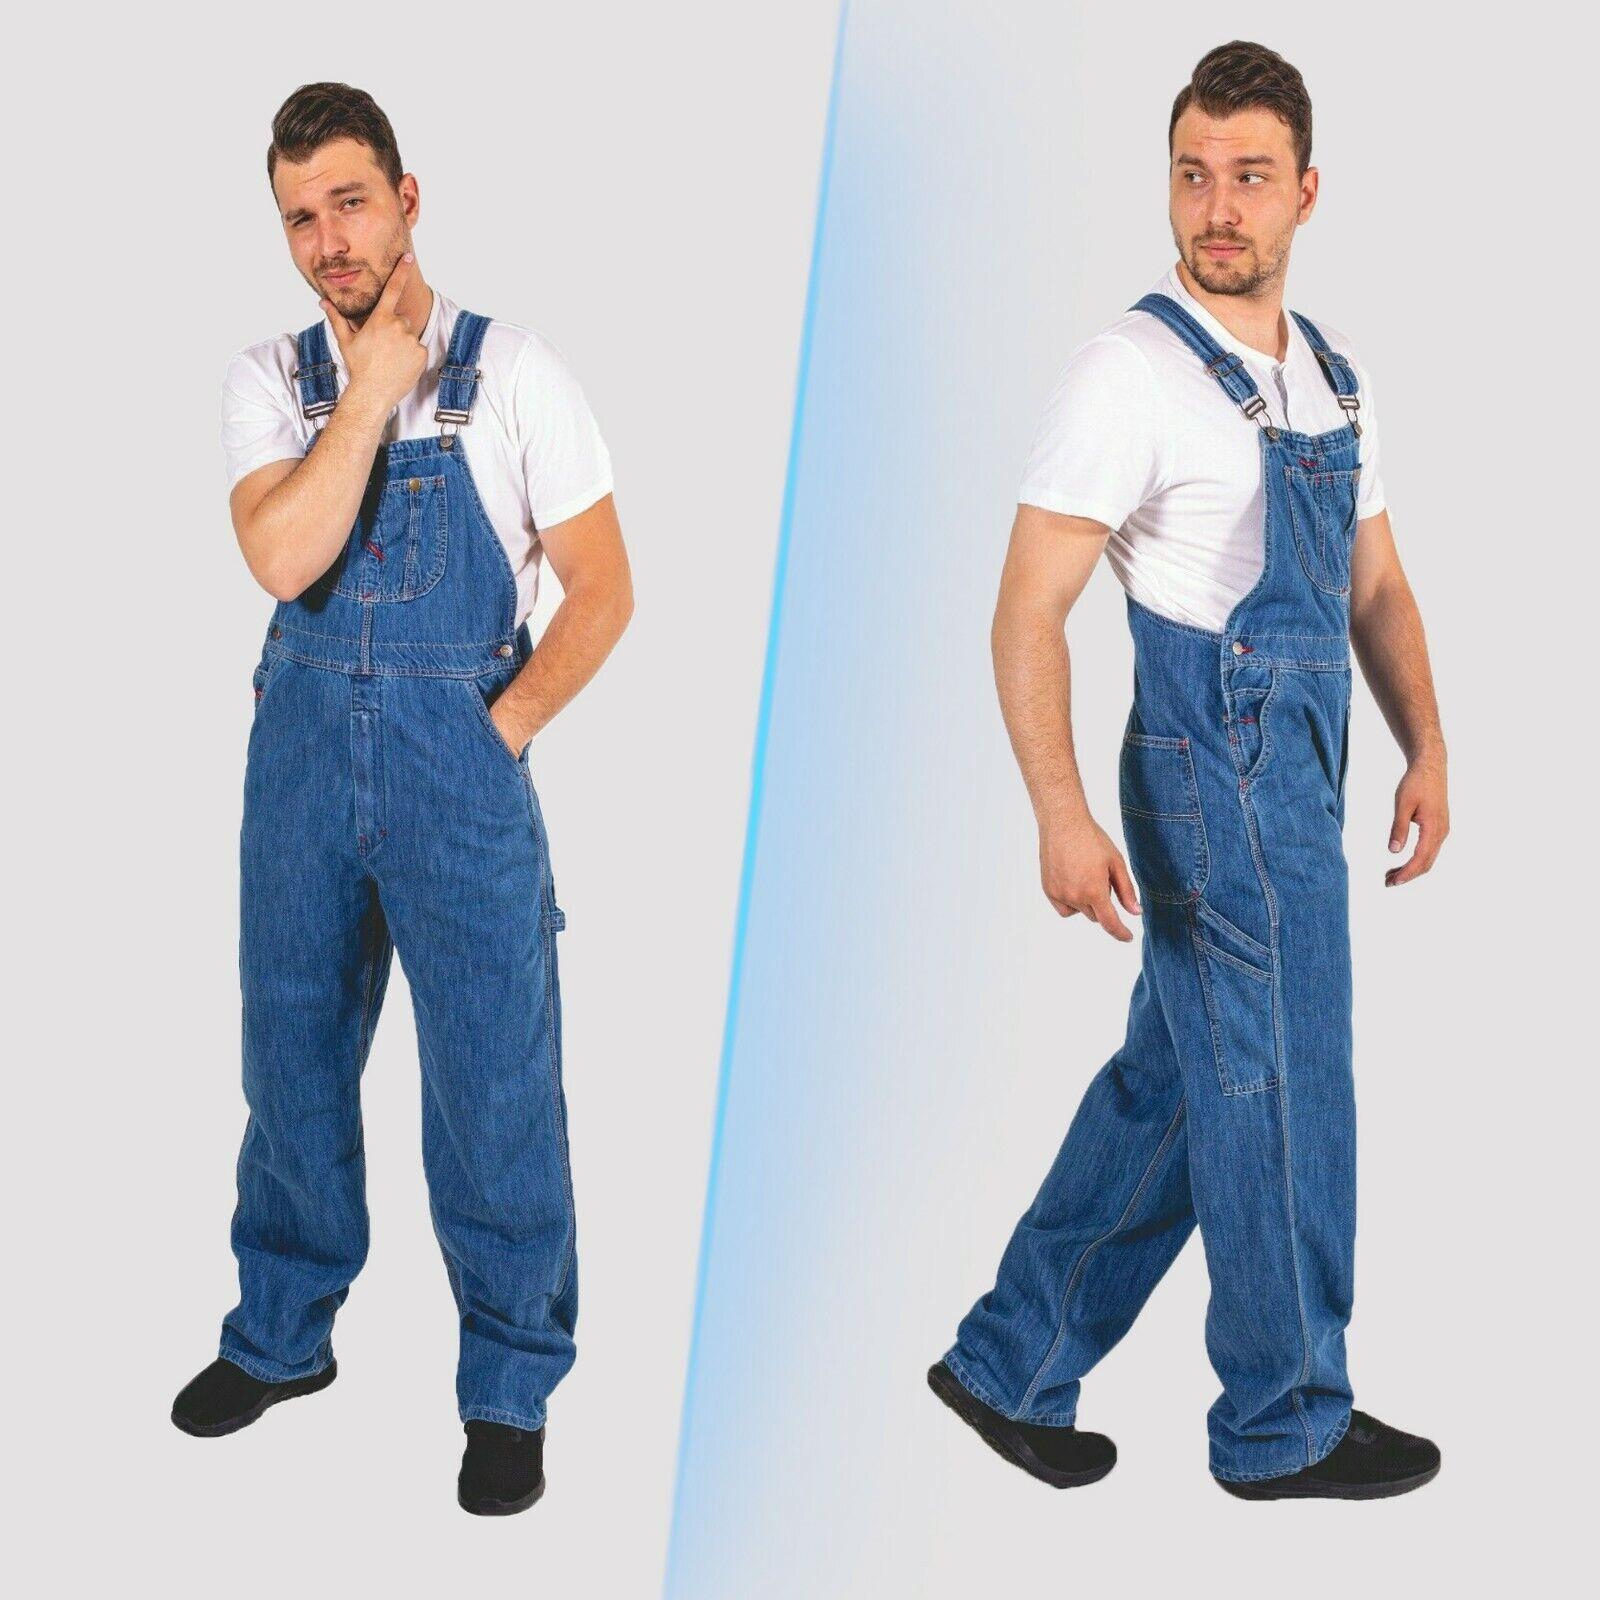 Men Denim Bib and Brace Overalls Painters Coveralls Pro Work Engineer Dungarees